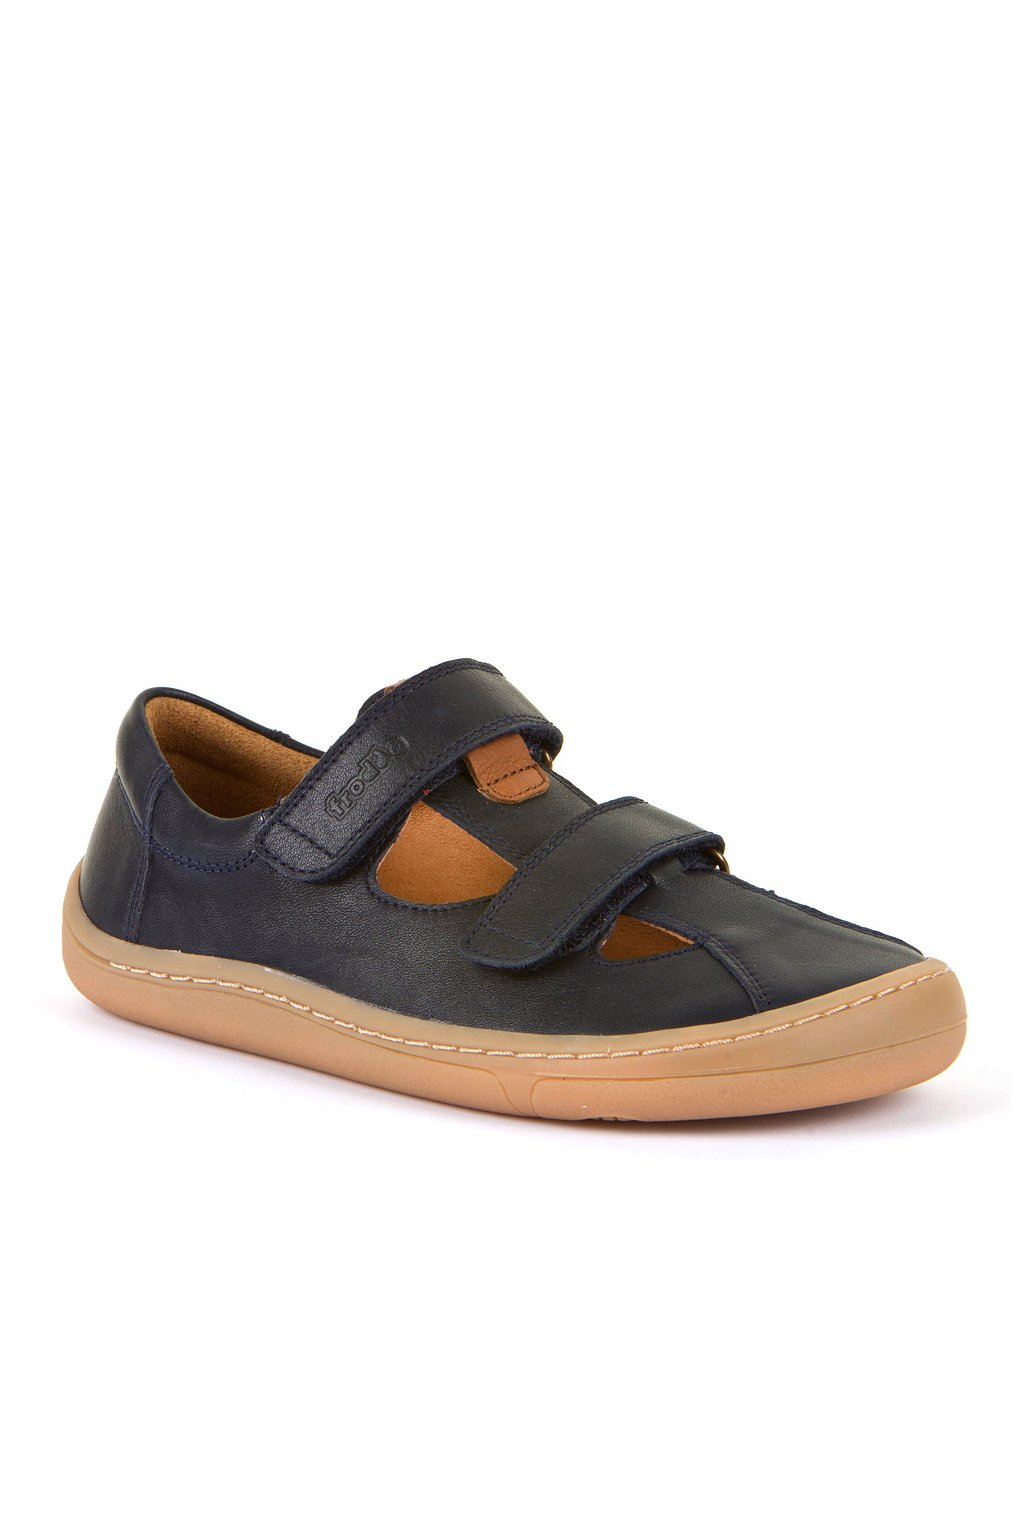 Froddo Barefoot sandálky - Navy